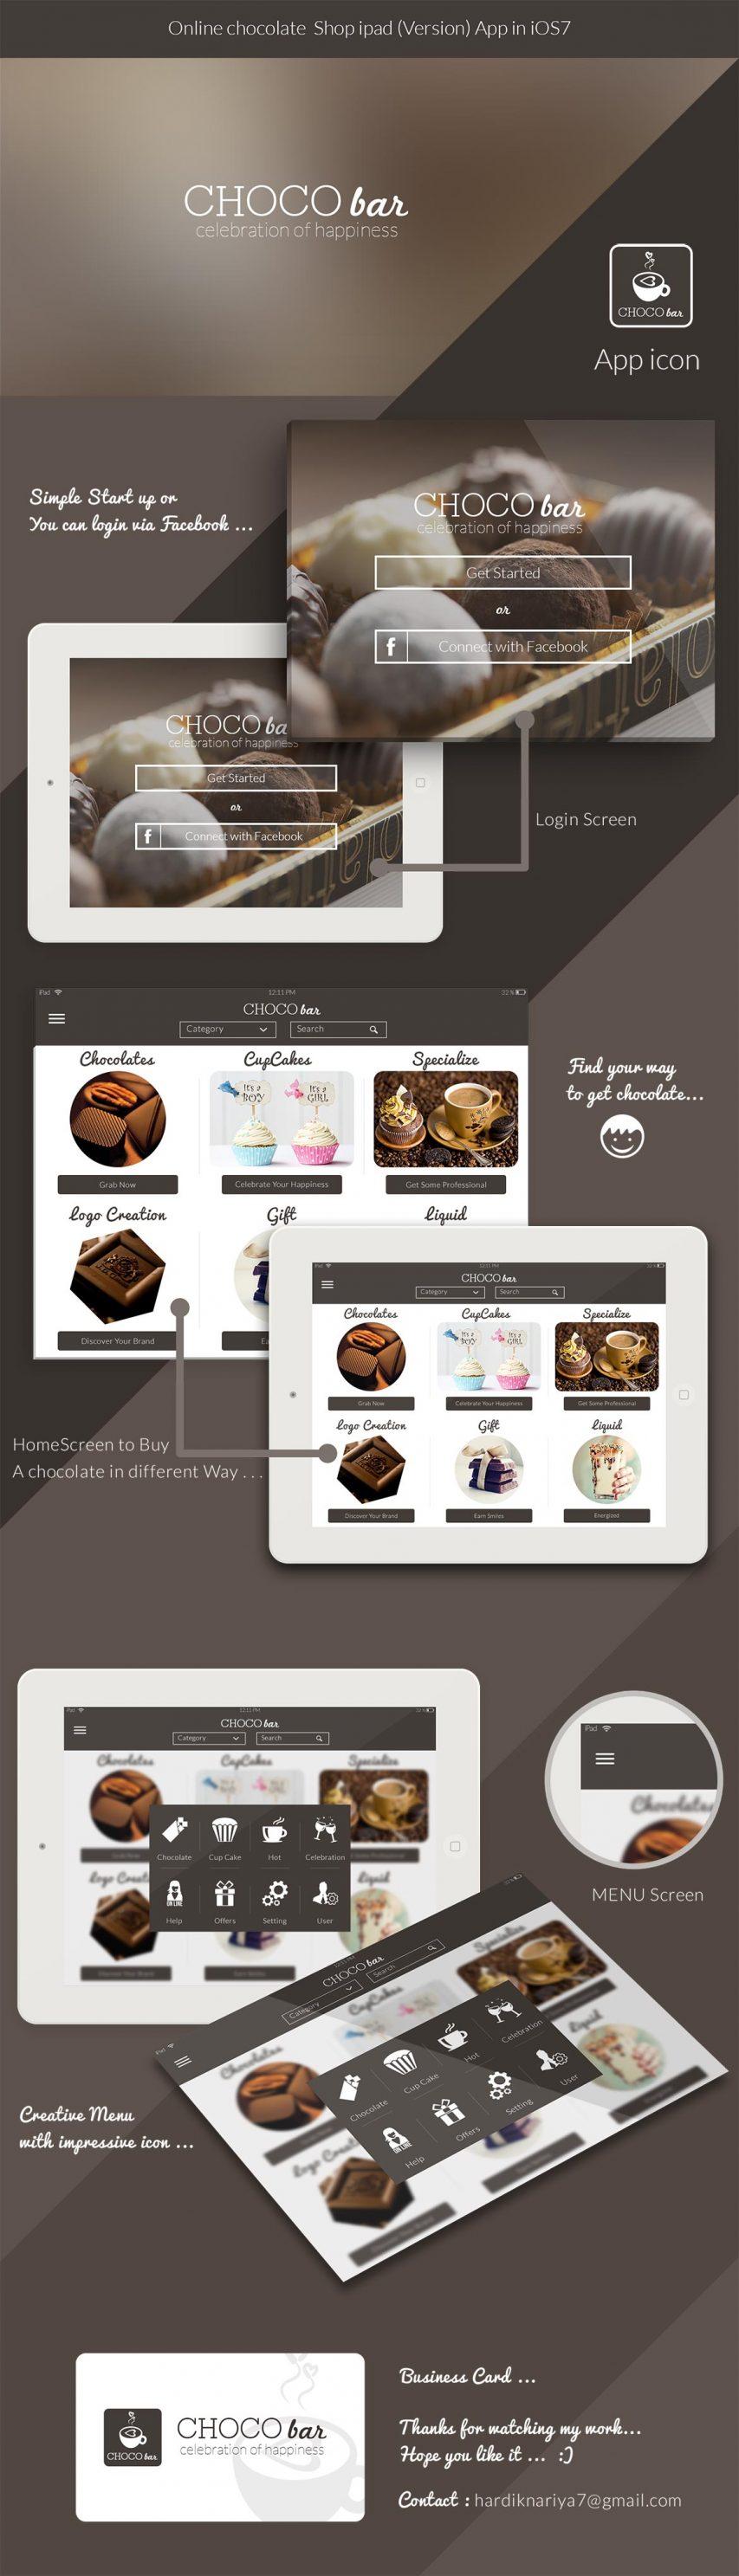 Bakery Store iPad App UI Kit Free